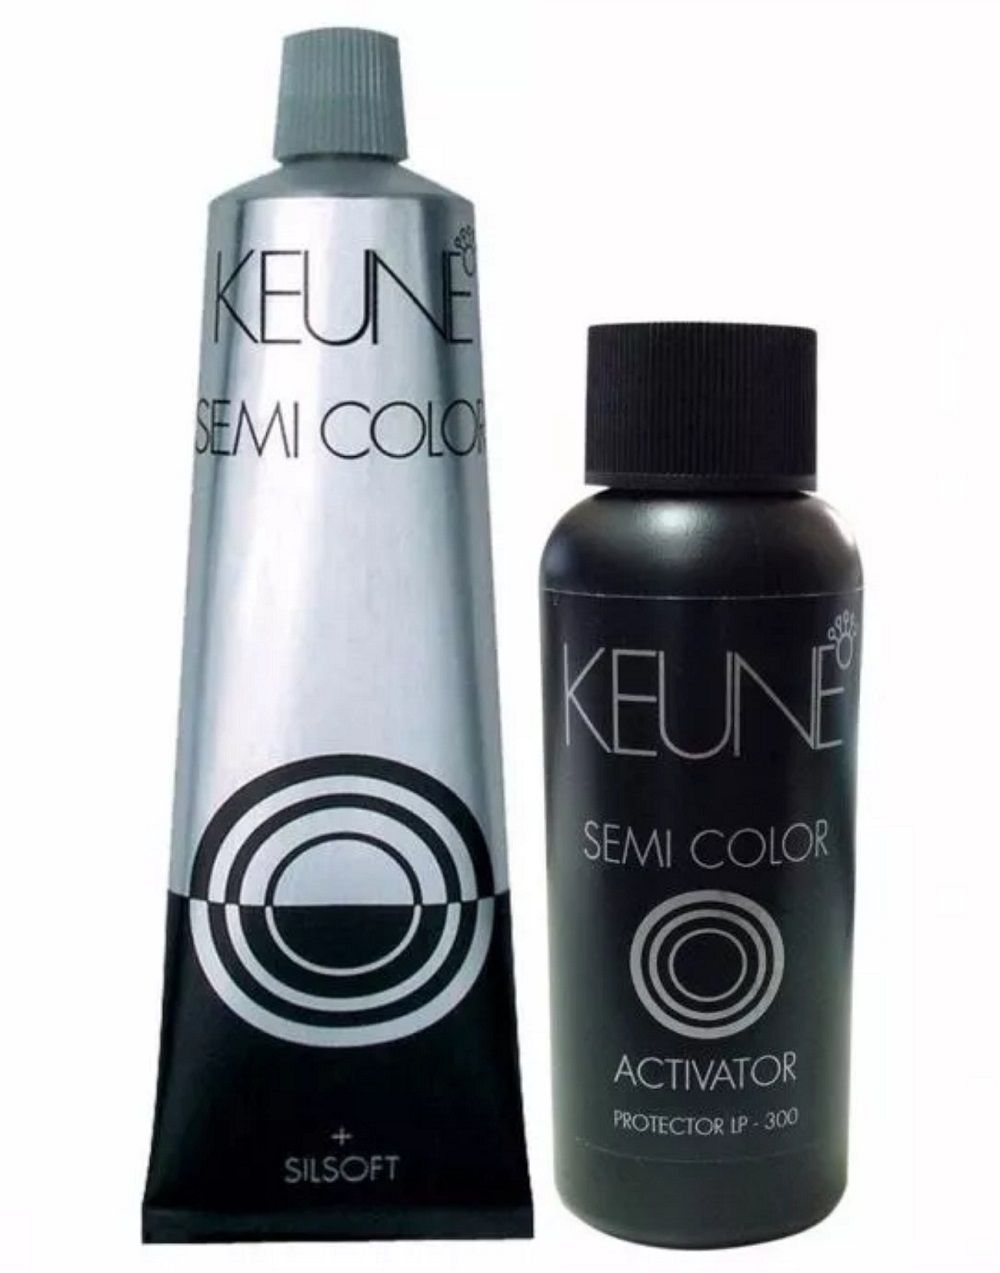 Kit Keune Tonalizante 60ml - Cor 9.32 - Louro Muito Claro Bege + Ativador 60ml